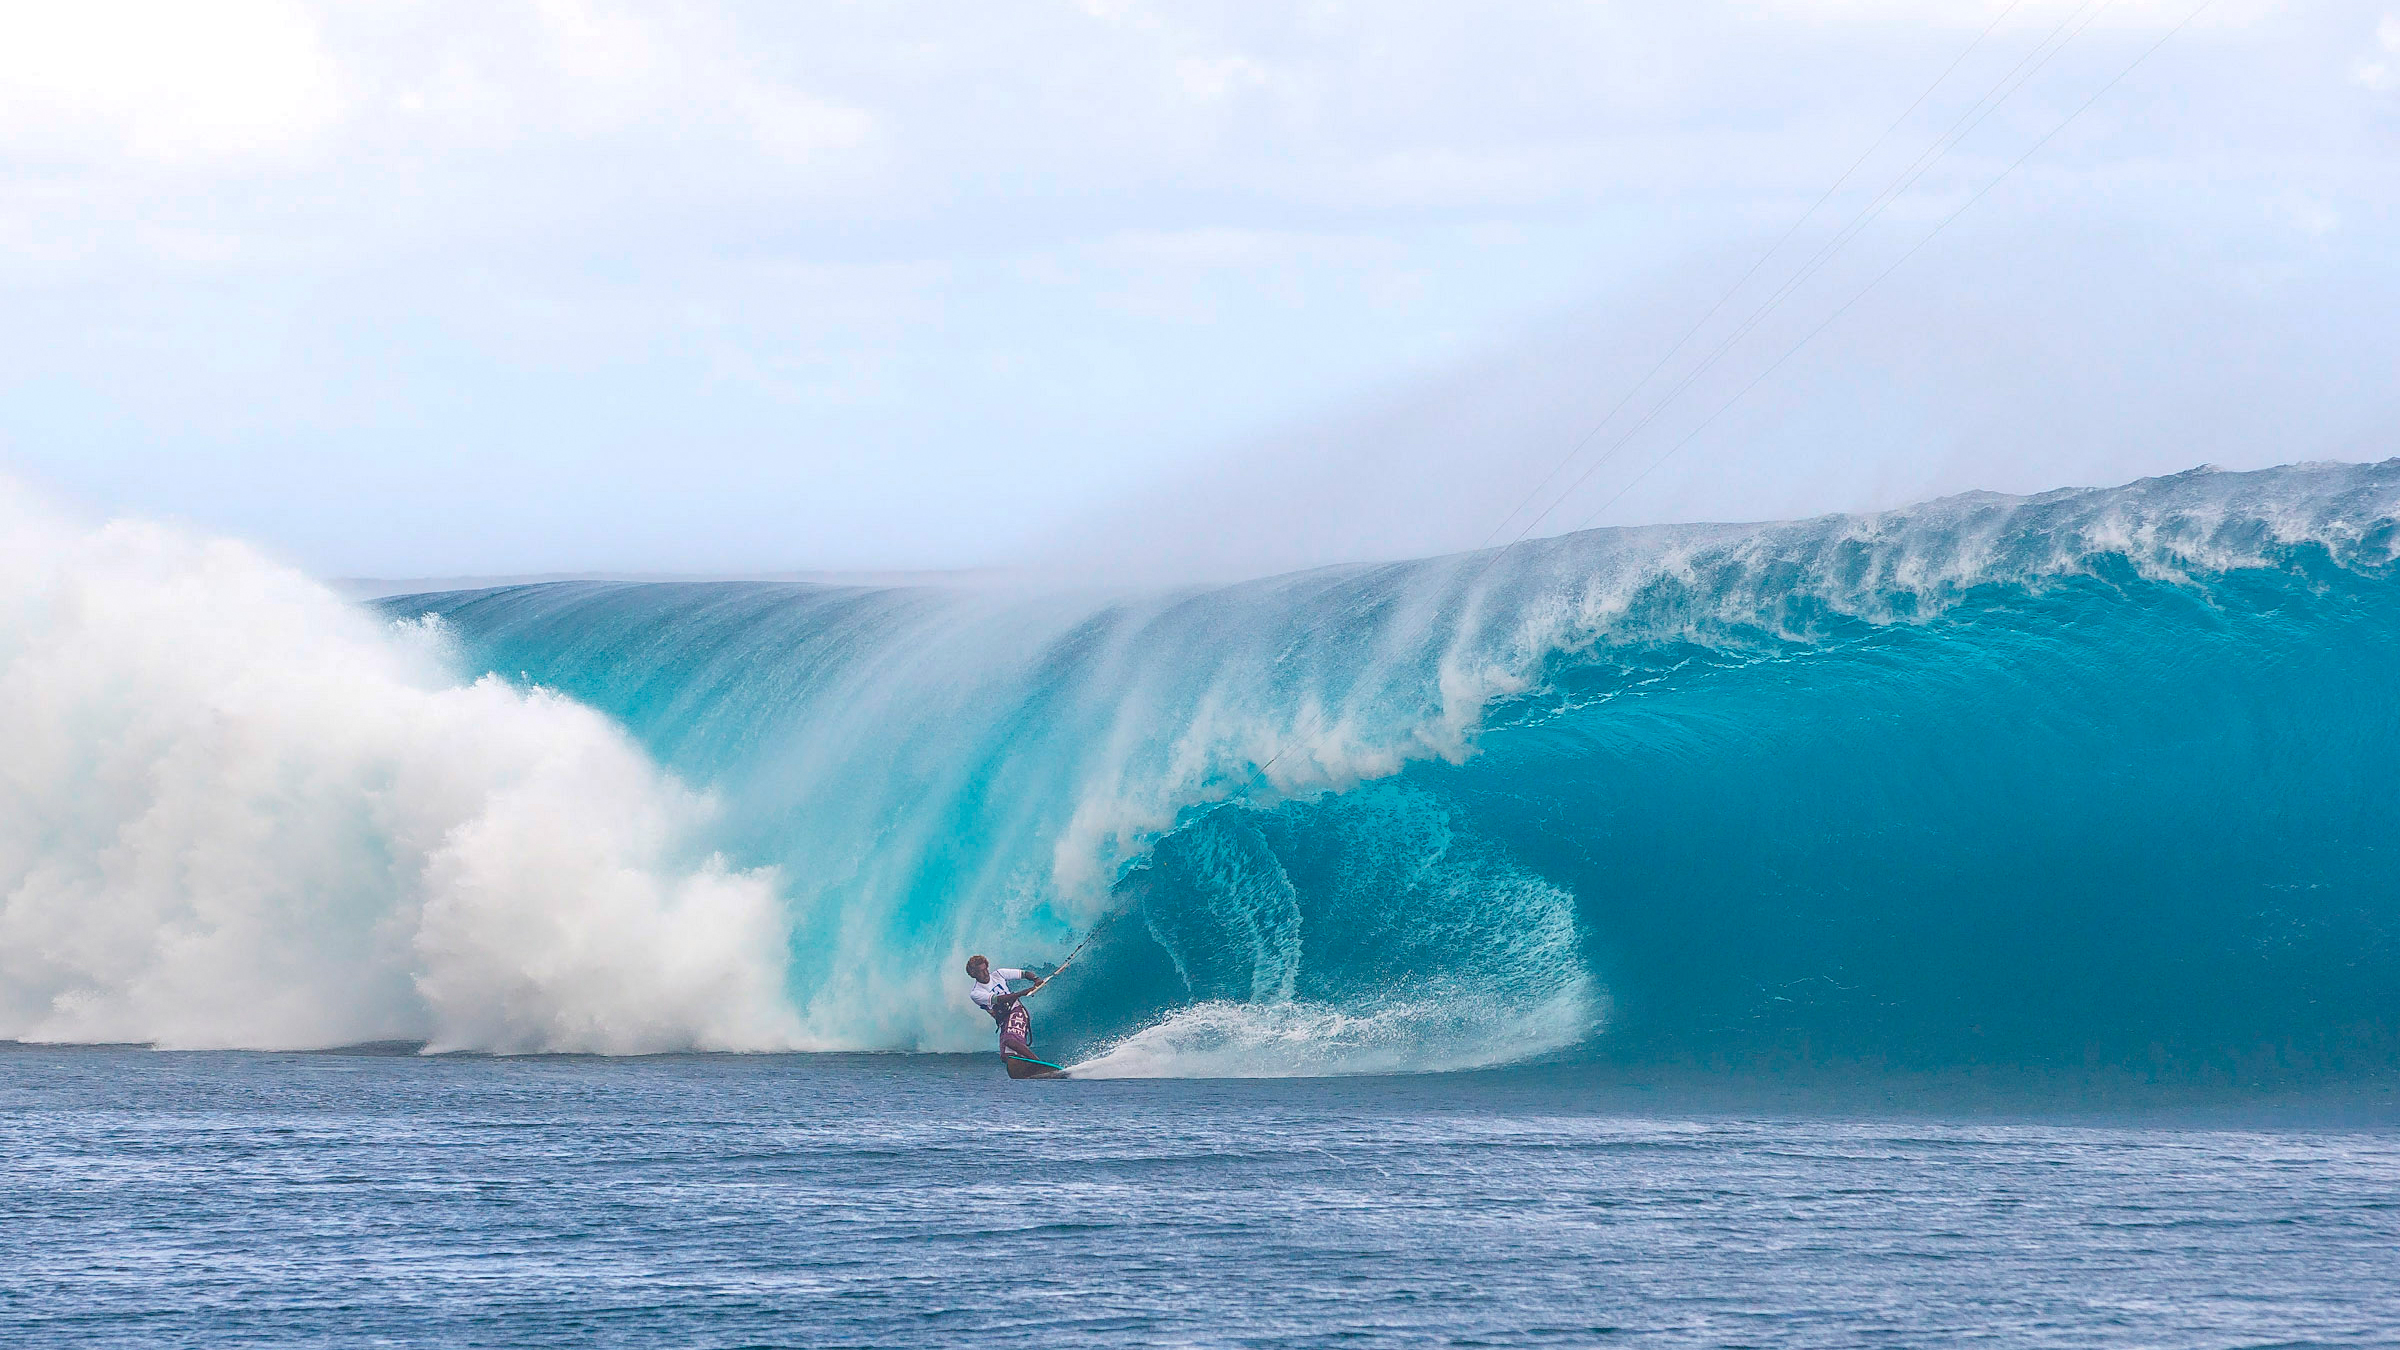 kitesurf wallpaper image - Mitu Monteiro taking on monster wave at Teahupoo - in resolution: High Definition - HD 16:9 2400 X 1350